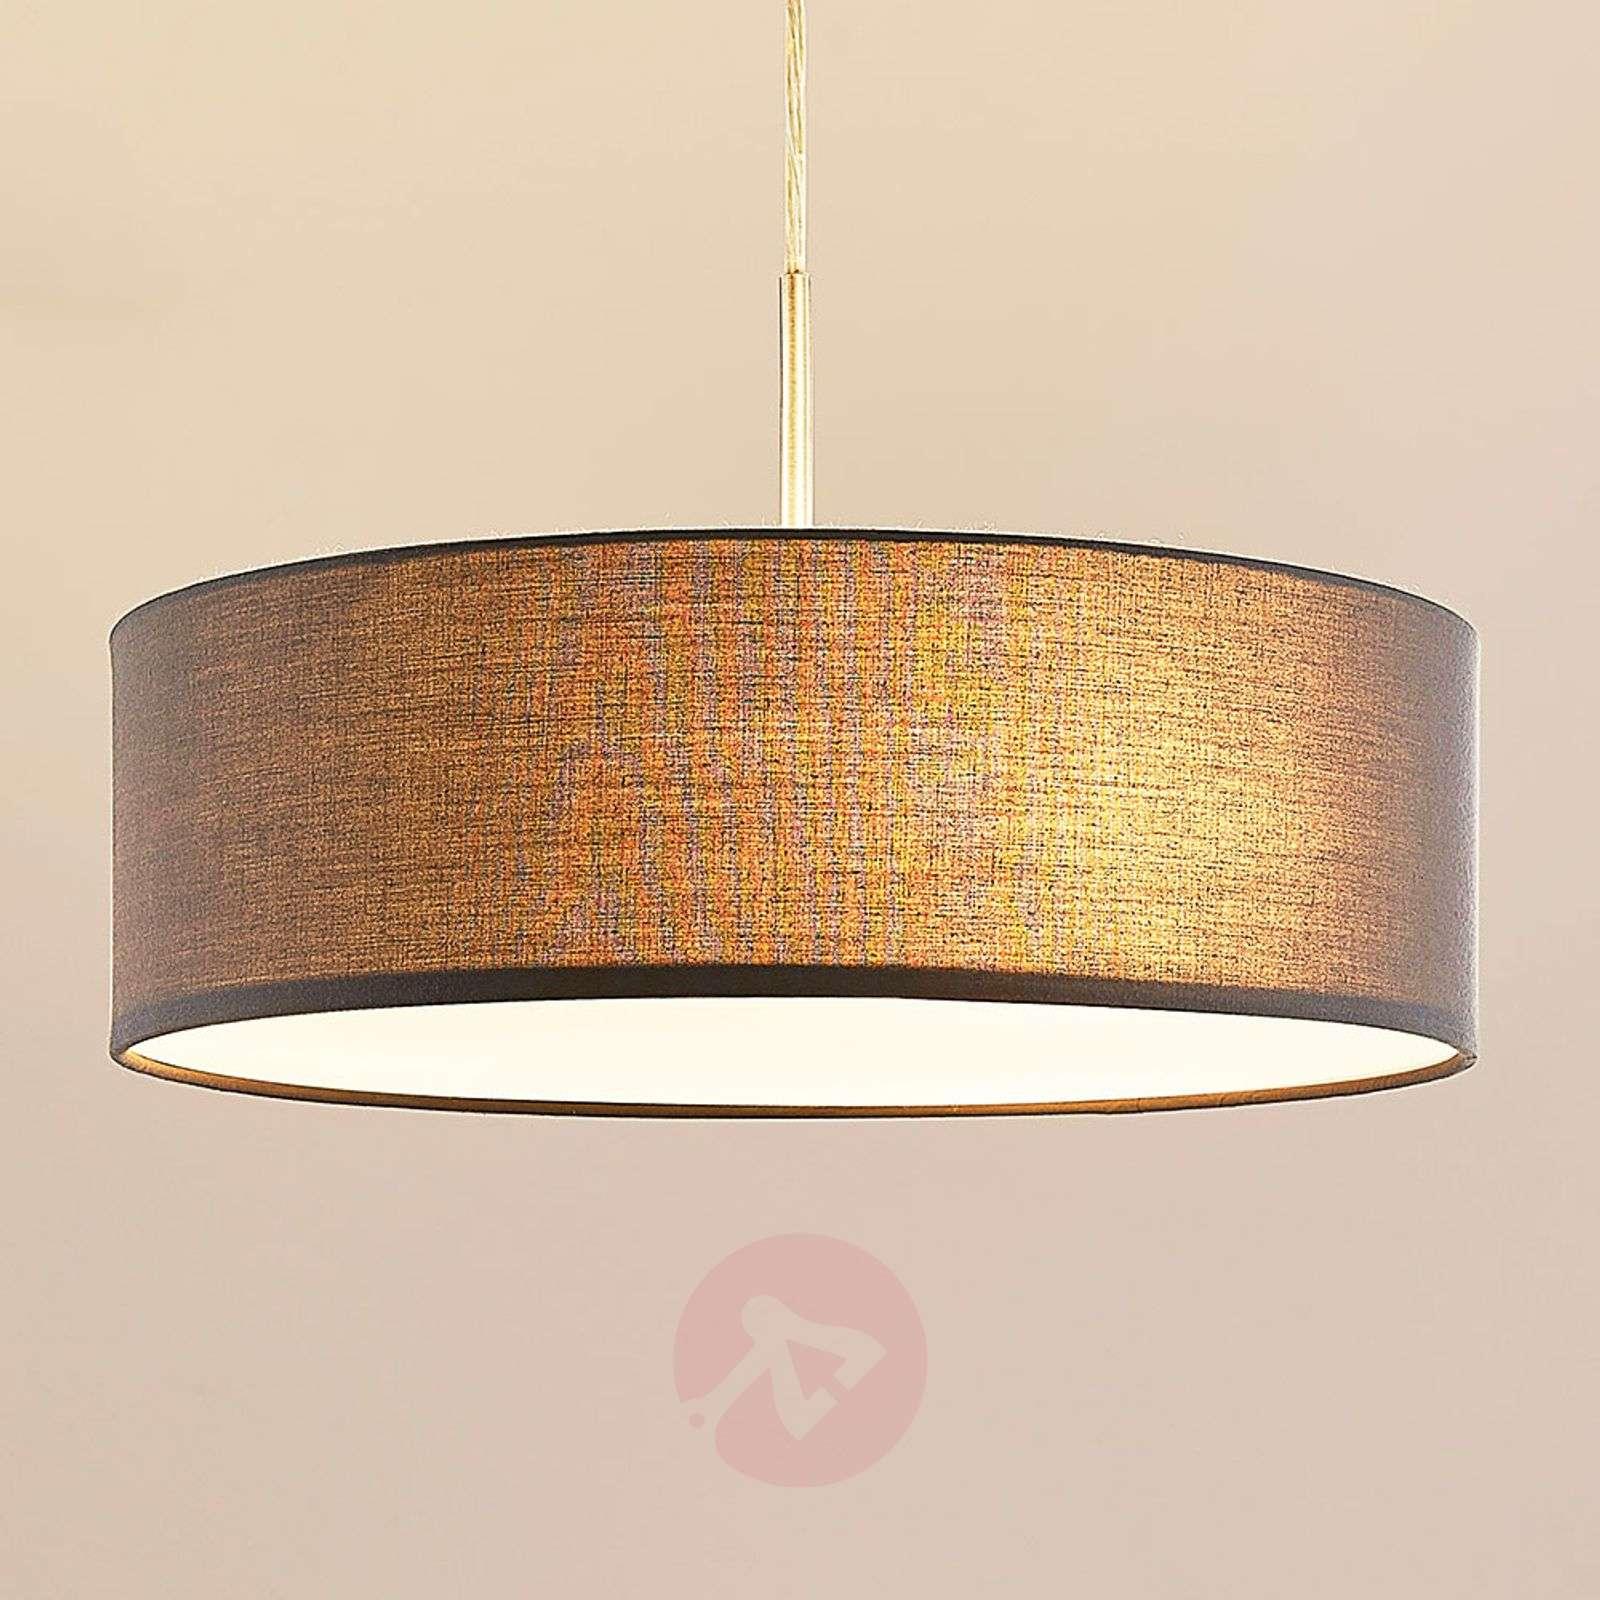 Sebatin fabric pendant light in grey-9620326-03